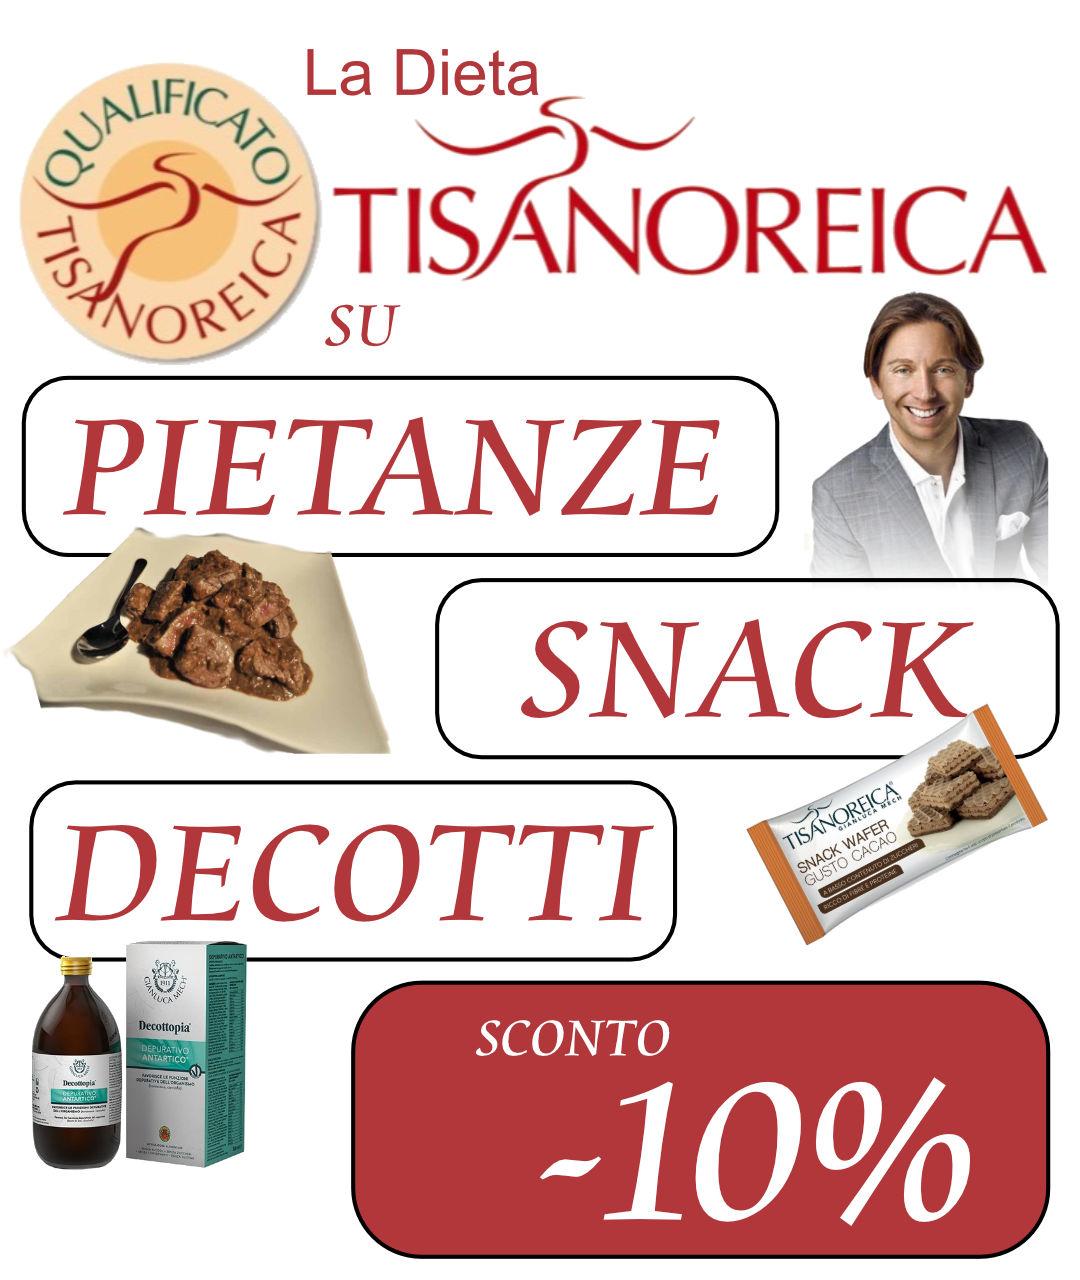 TISANOREICA-10X100-piet-snack-decot